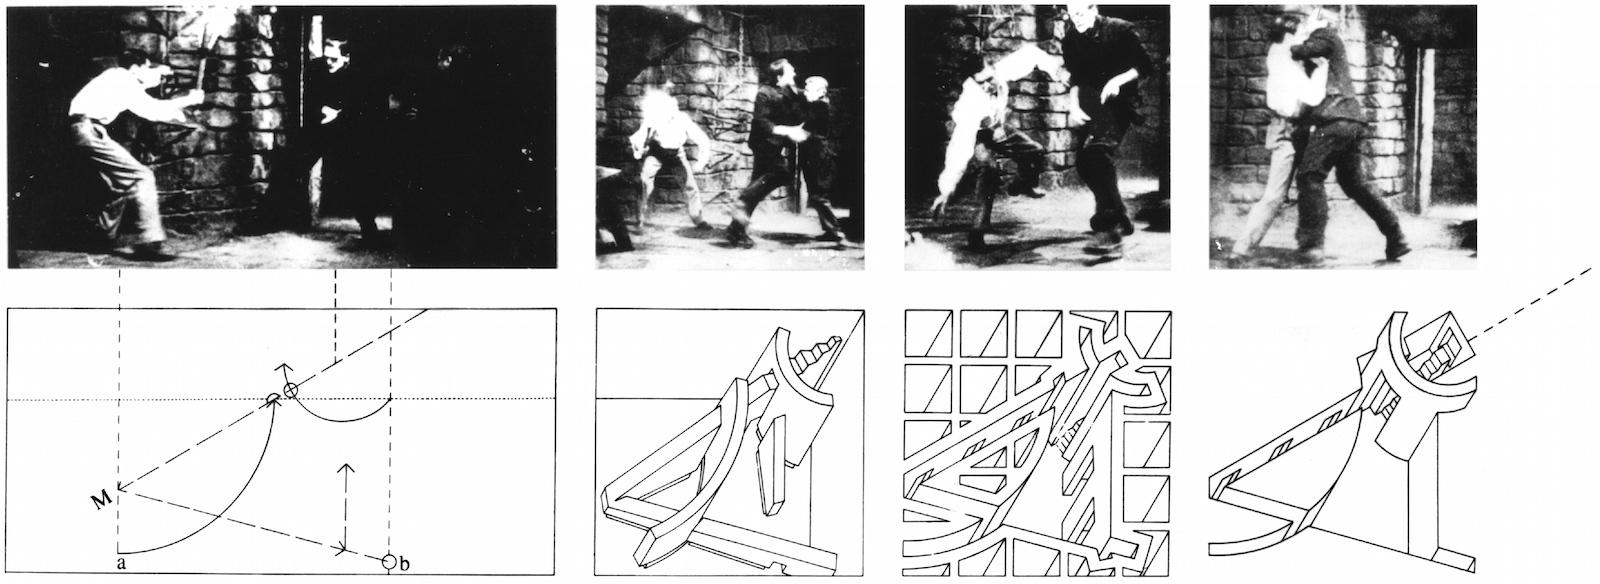 Bathroom design tumblr - An Interview With Bernard Tschumi Uncube